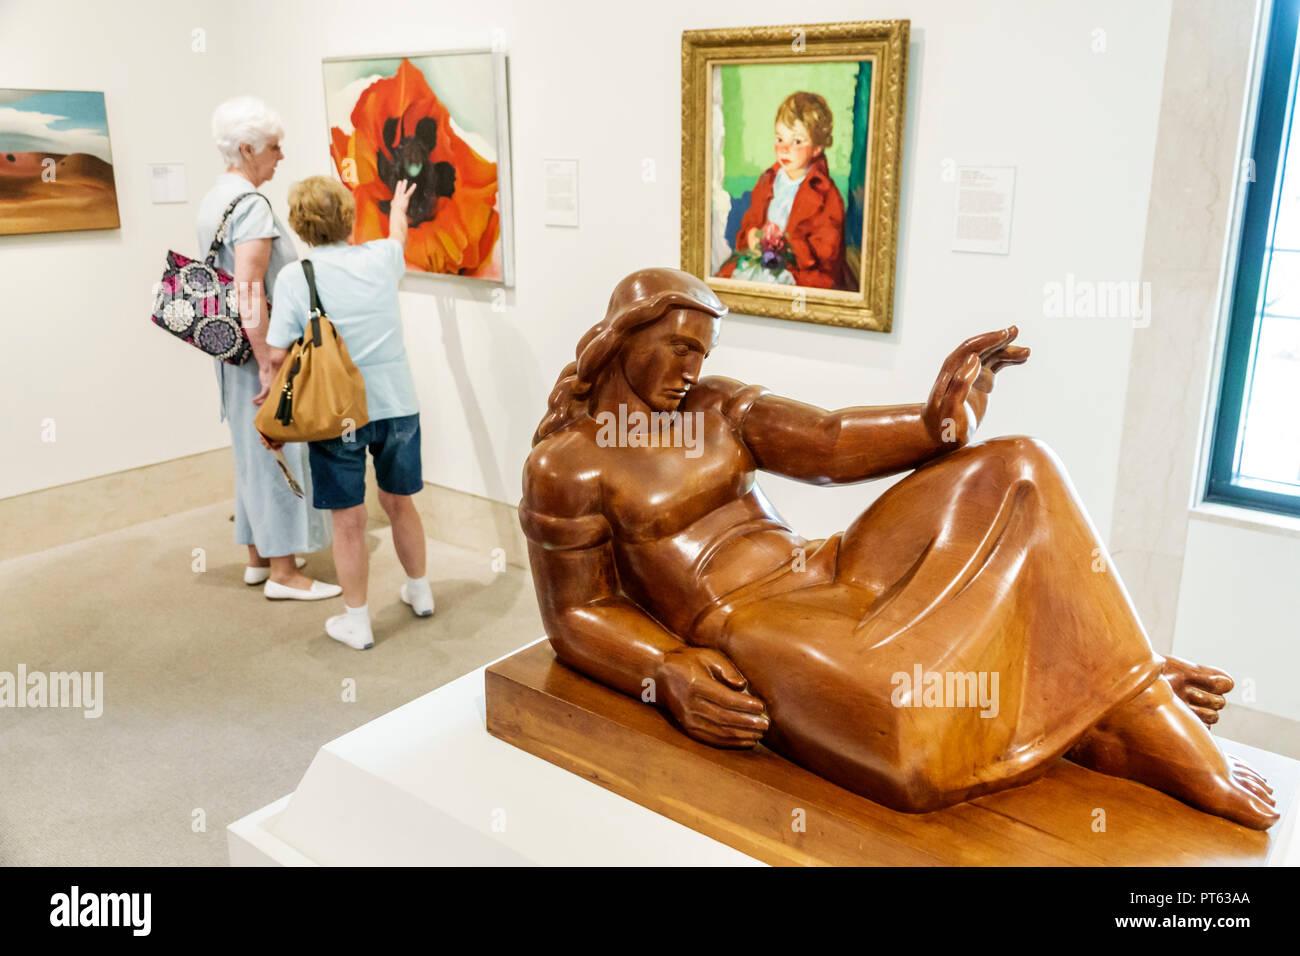 St. Saint Petersburg Florida Museum of Fine Arts interior Albert Wein artist New Horizons 1937 cherry wood senior woman friends - Stock Image